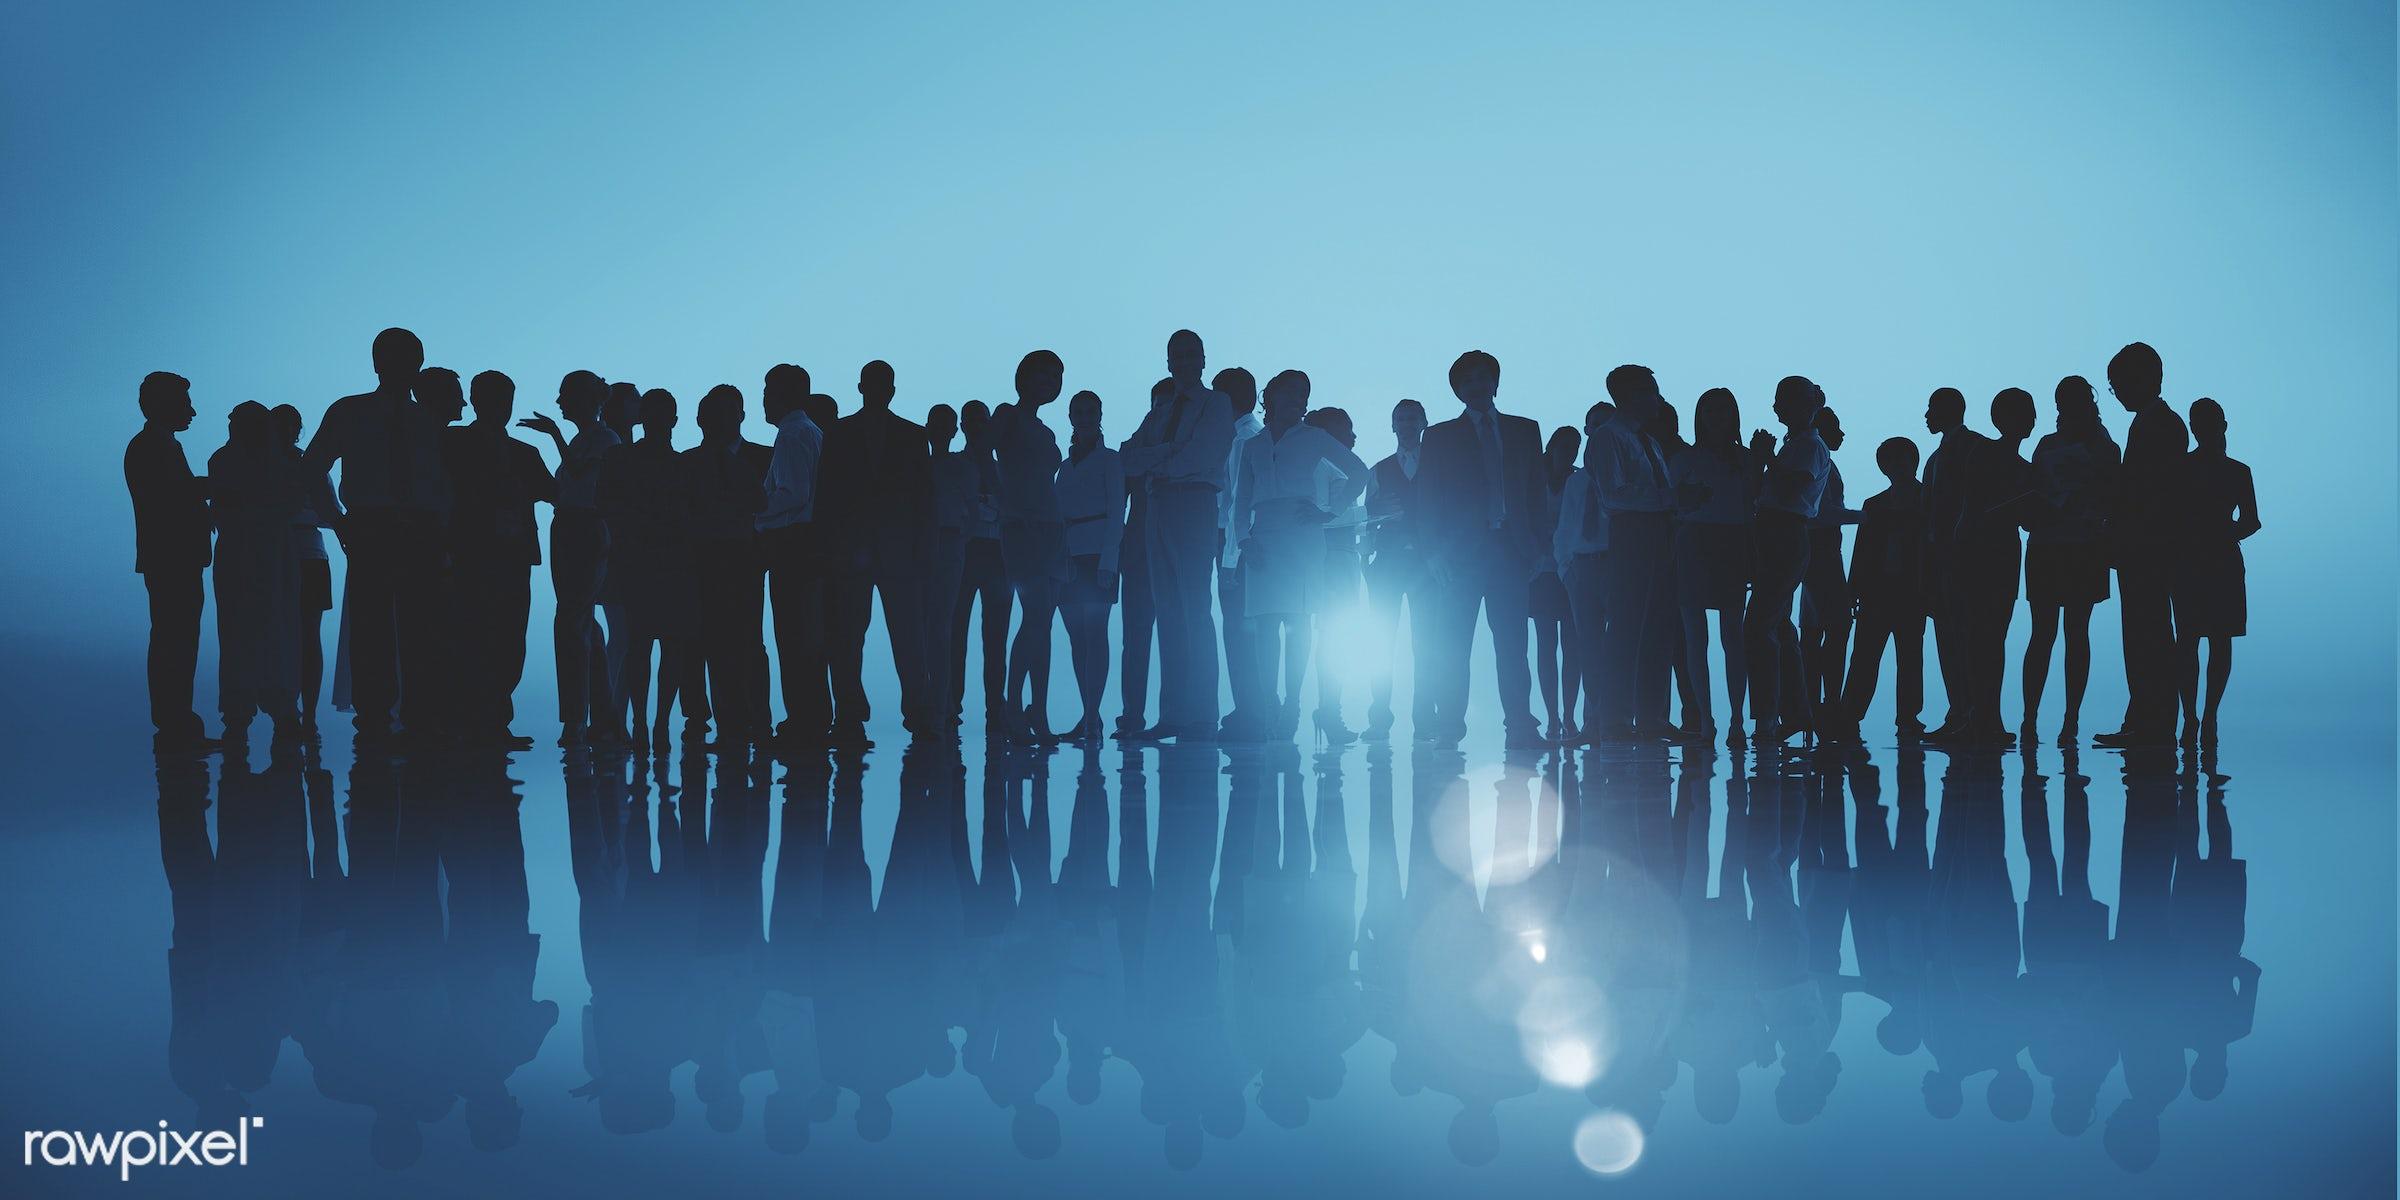 advice, agreement, back lit, blue, brainstorming, business, business people, businessmen, businesswomen, collaboration,...